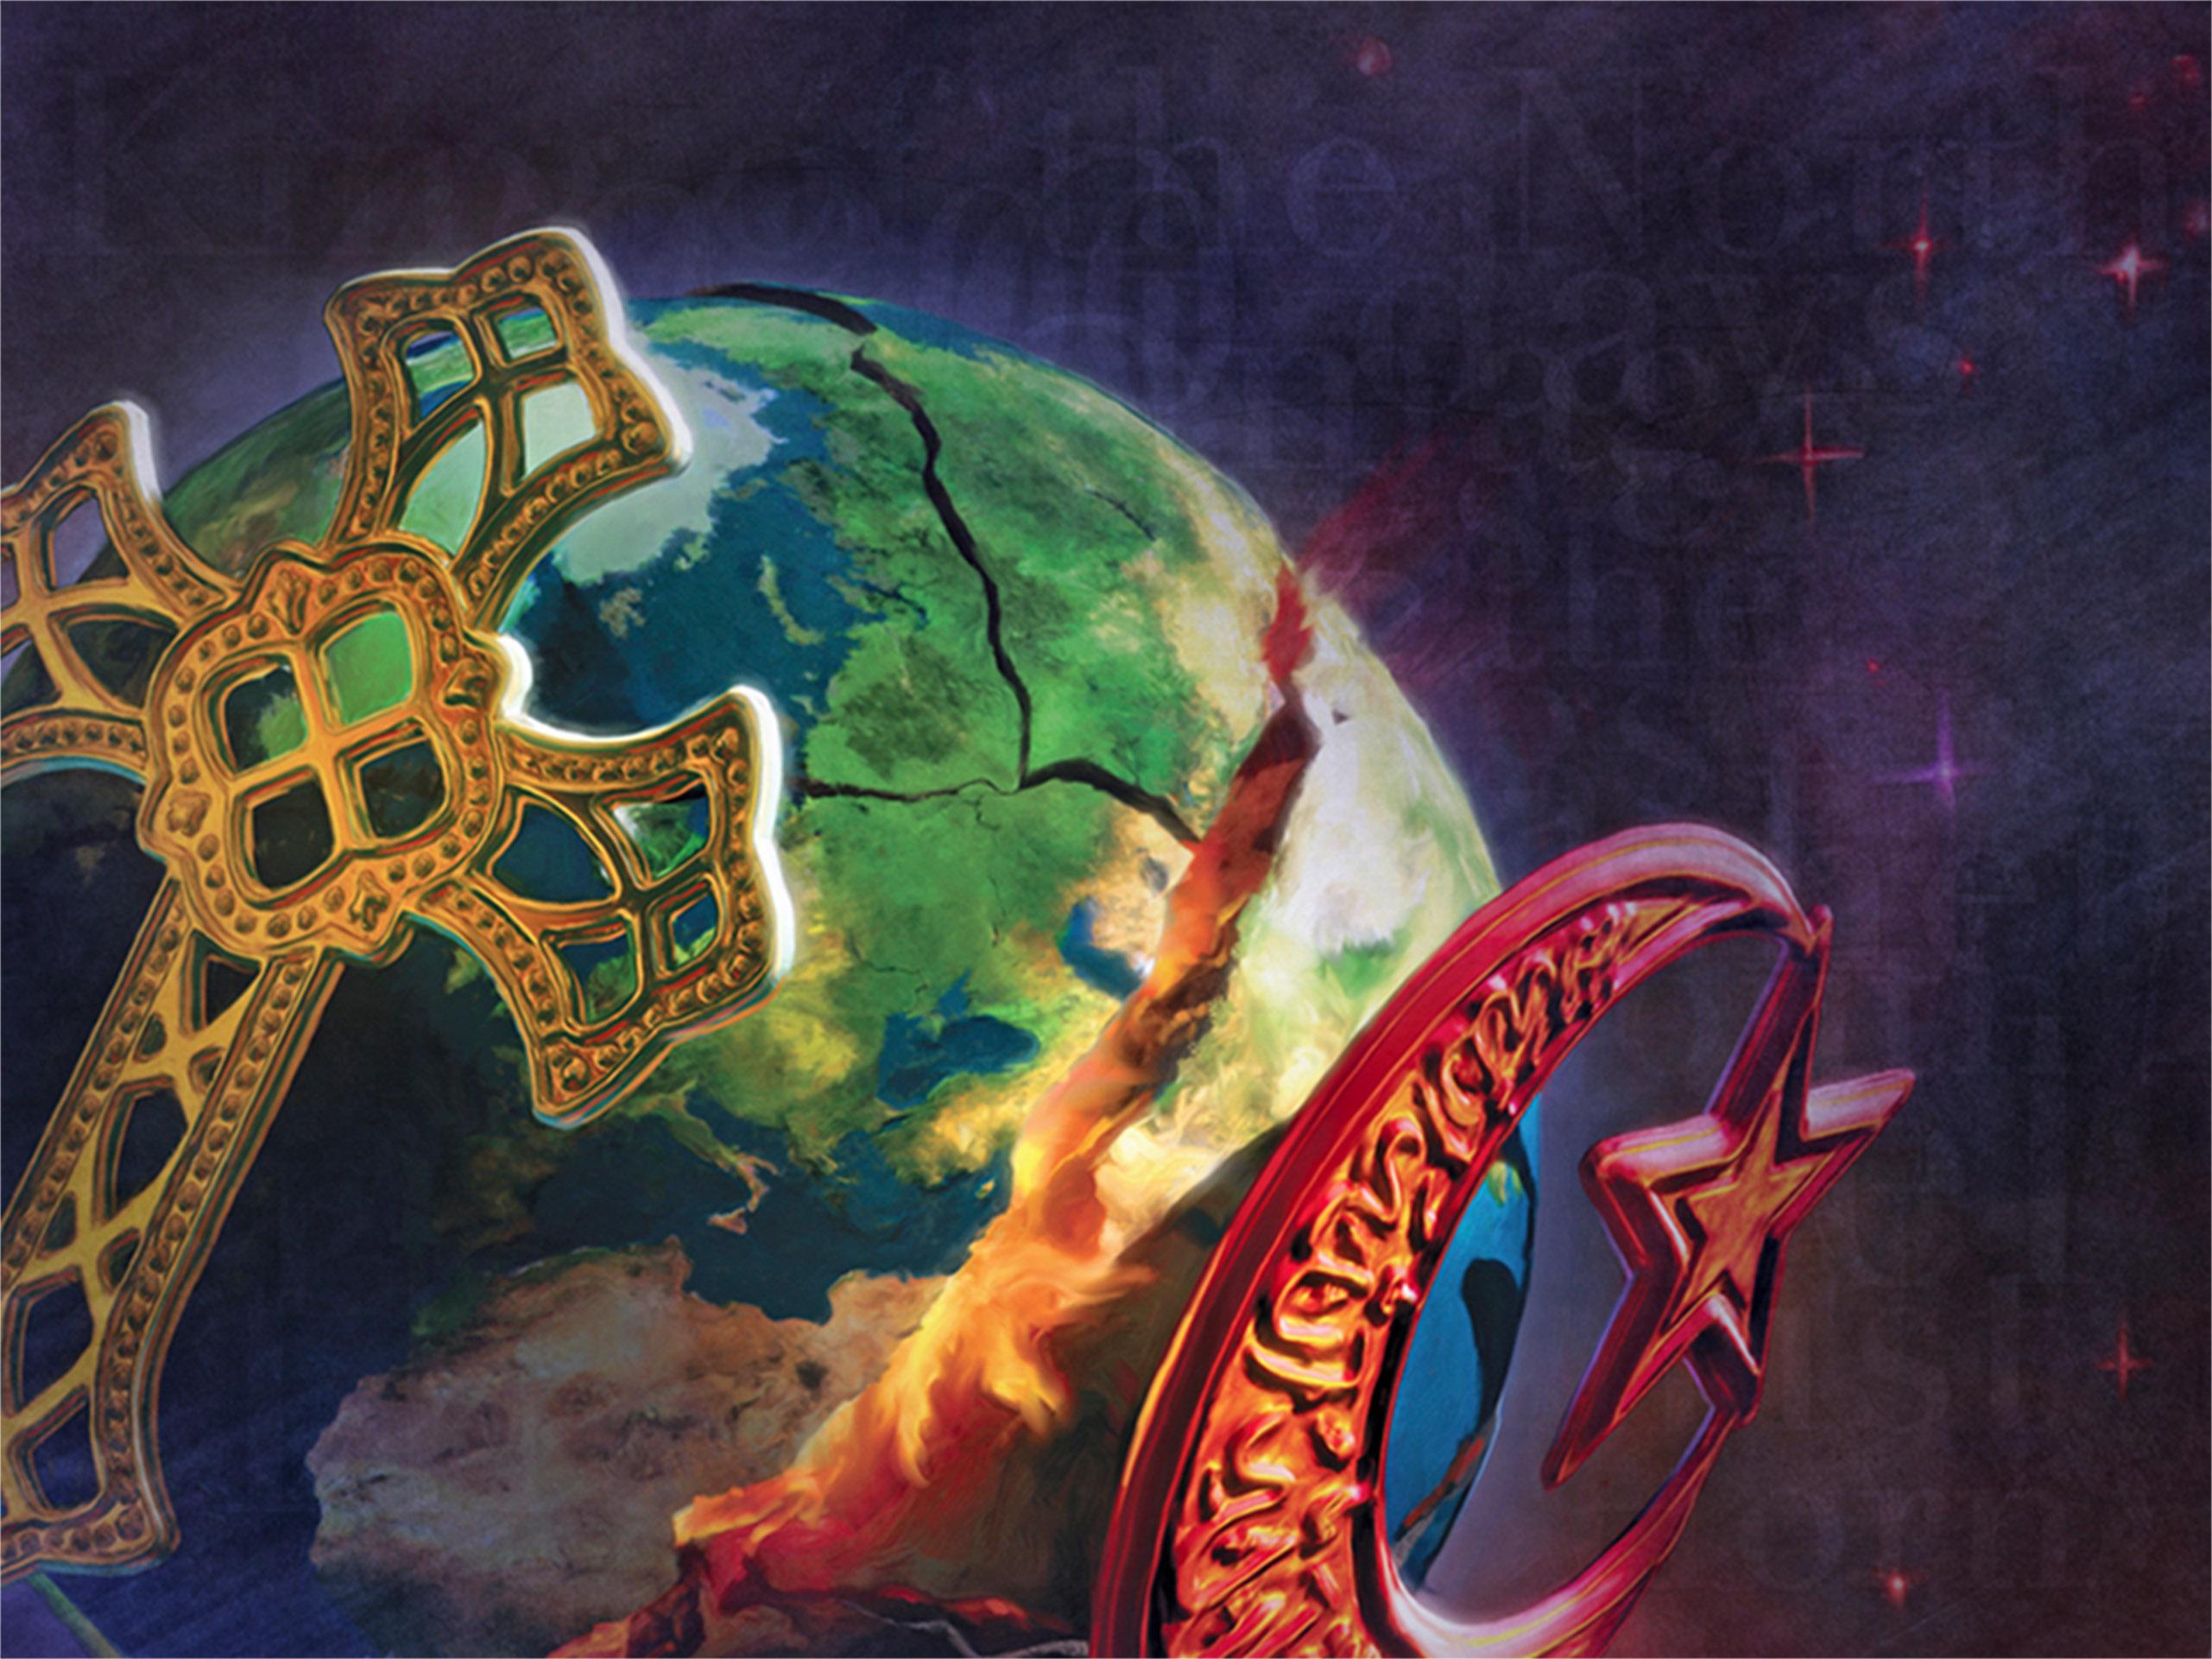 https://www.islamandchristianity.org/wp-content/uploads/2015/06/YouTube-background2.jpg